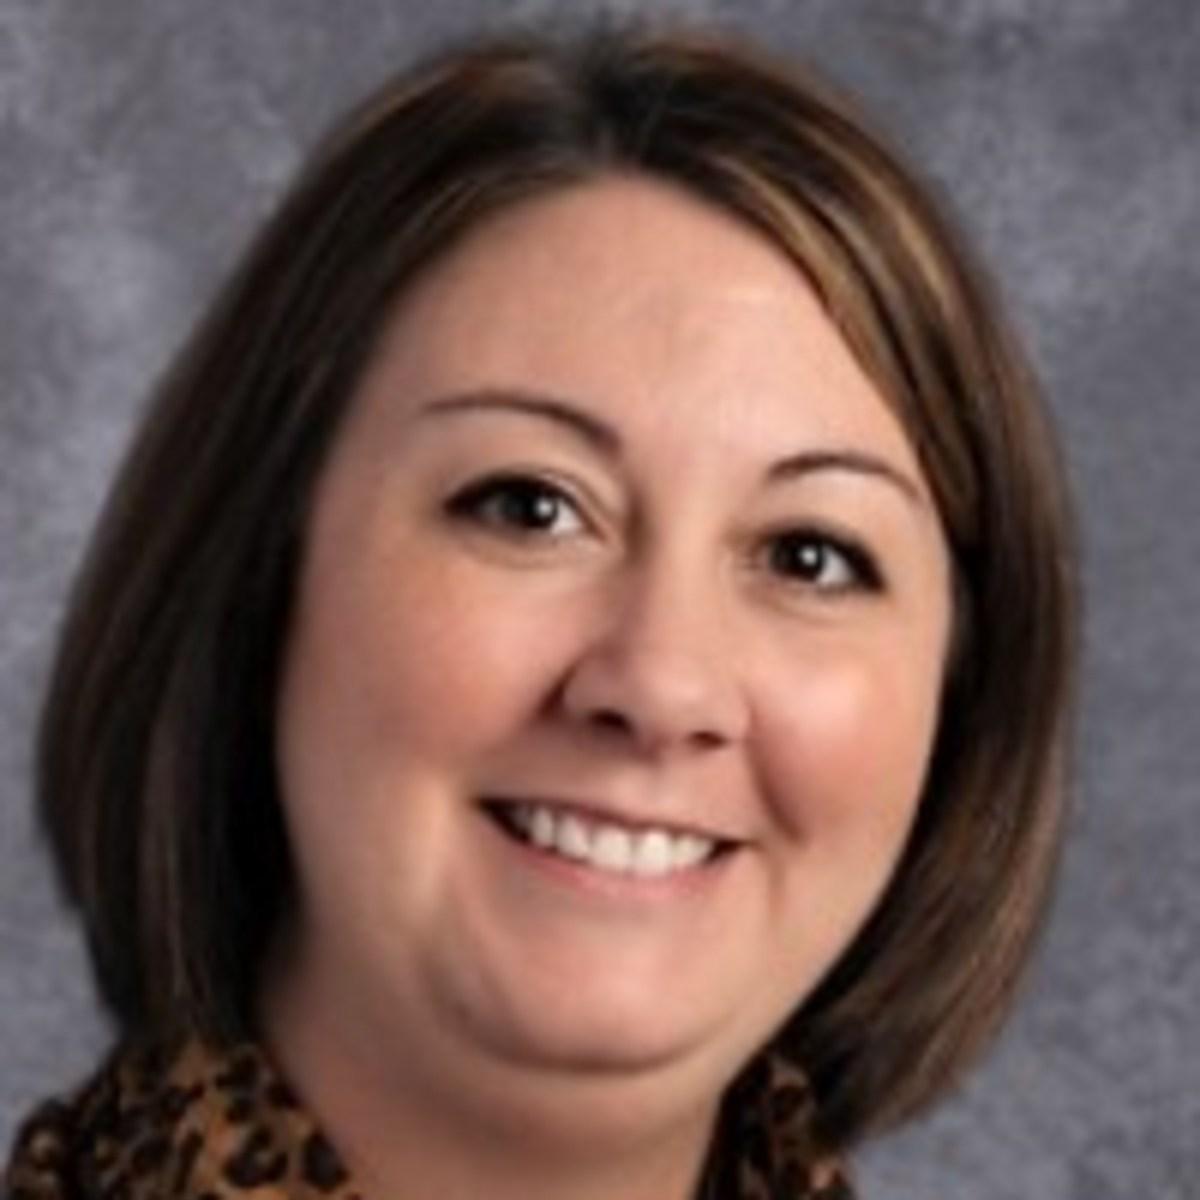 staff dalton intermediate school home radford city schools angela gess s profile photo